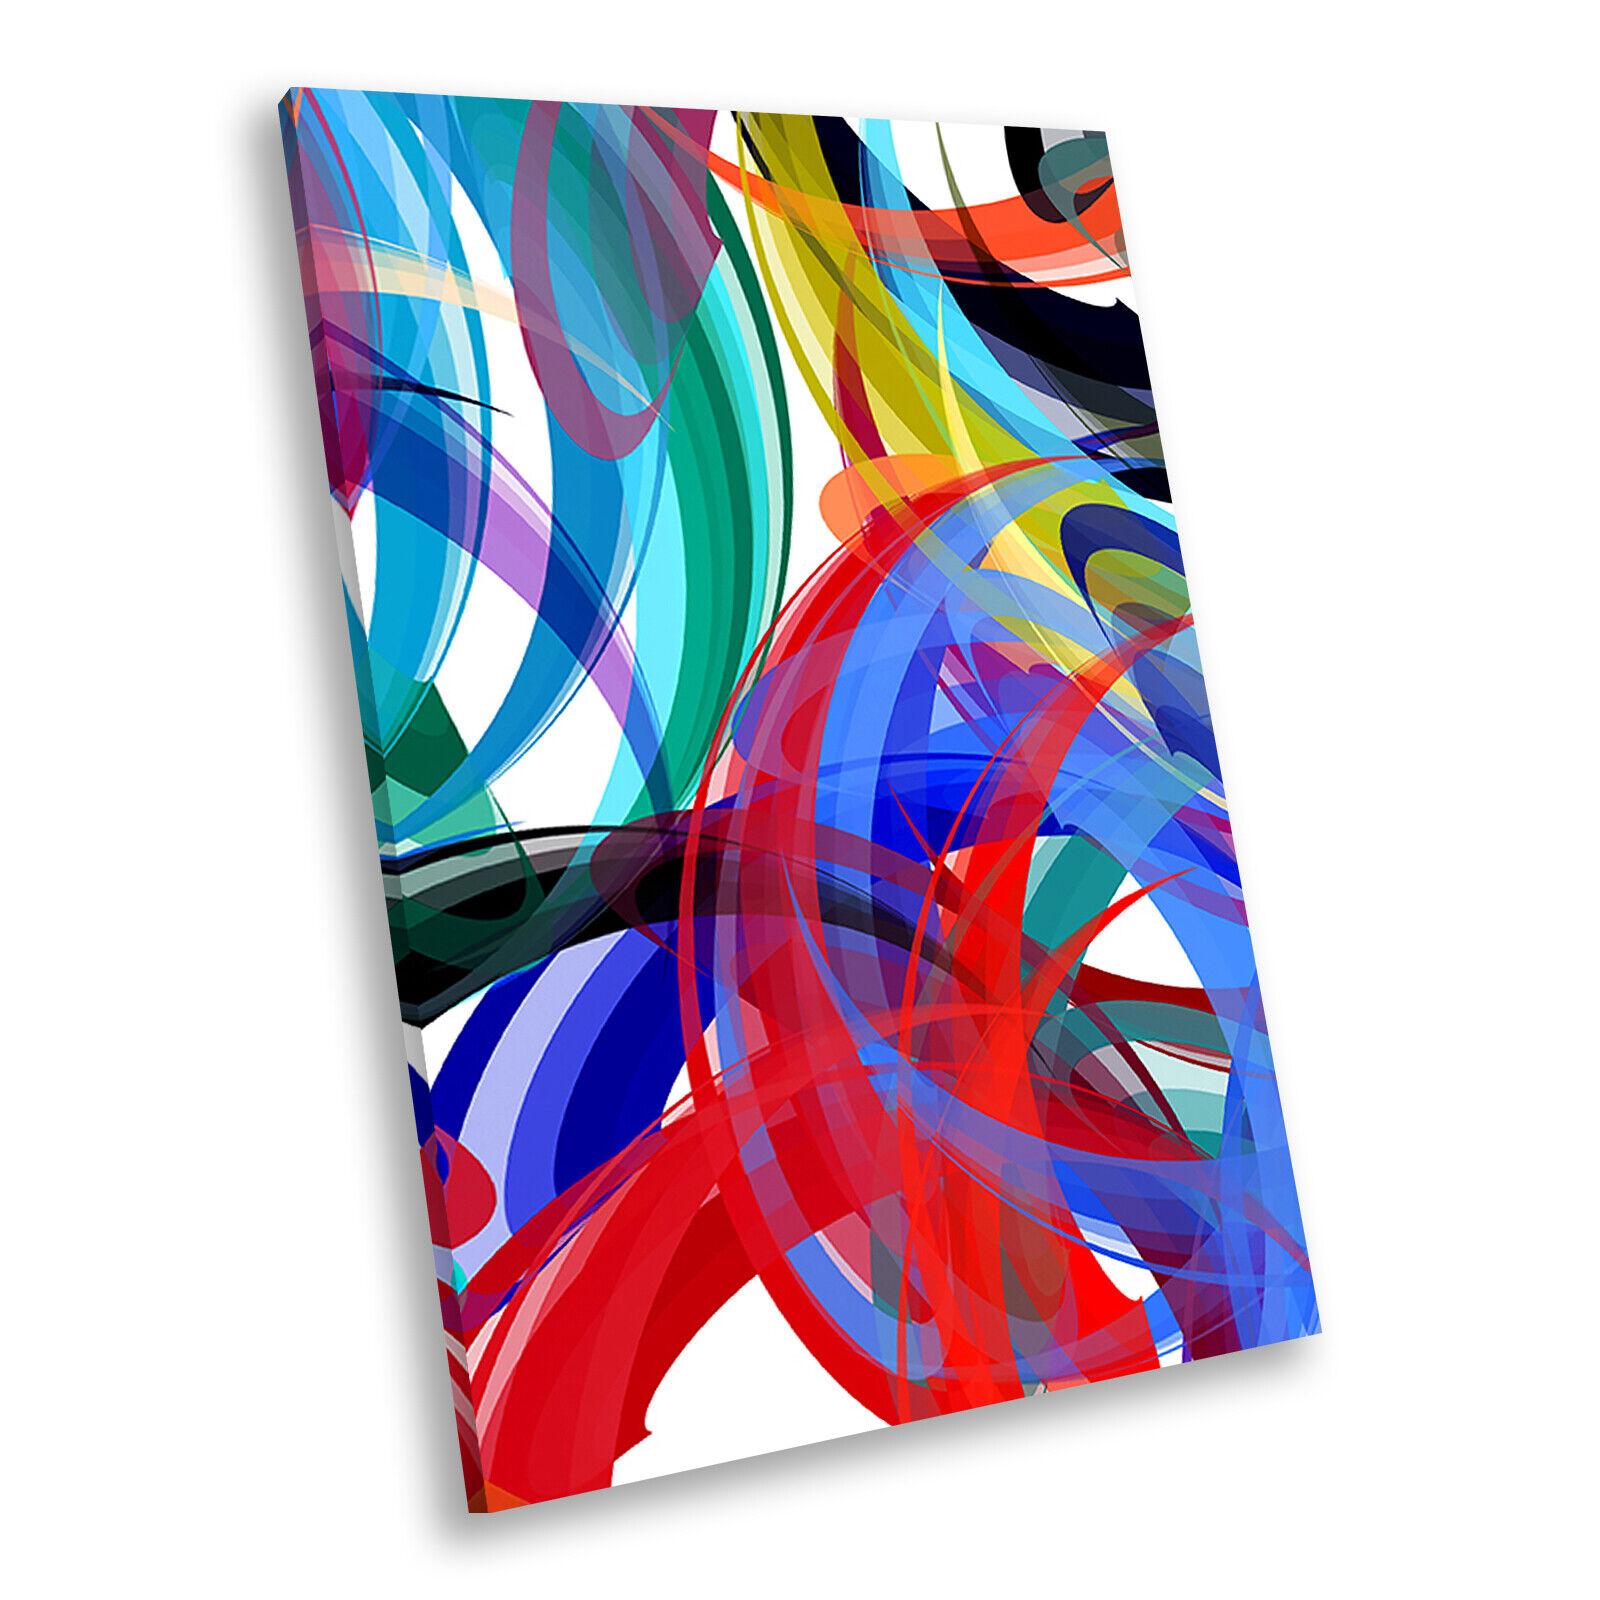 rot Blau Grün Teal Portrait Abstract Canvas Wand Kunst Large Bild Druckens